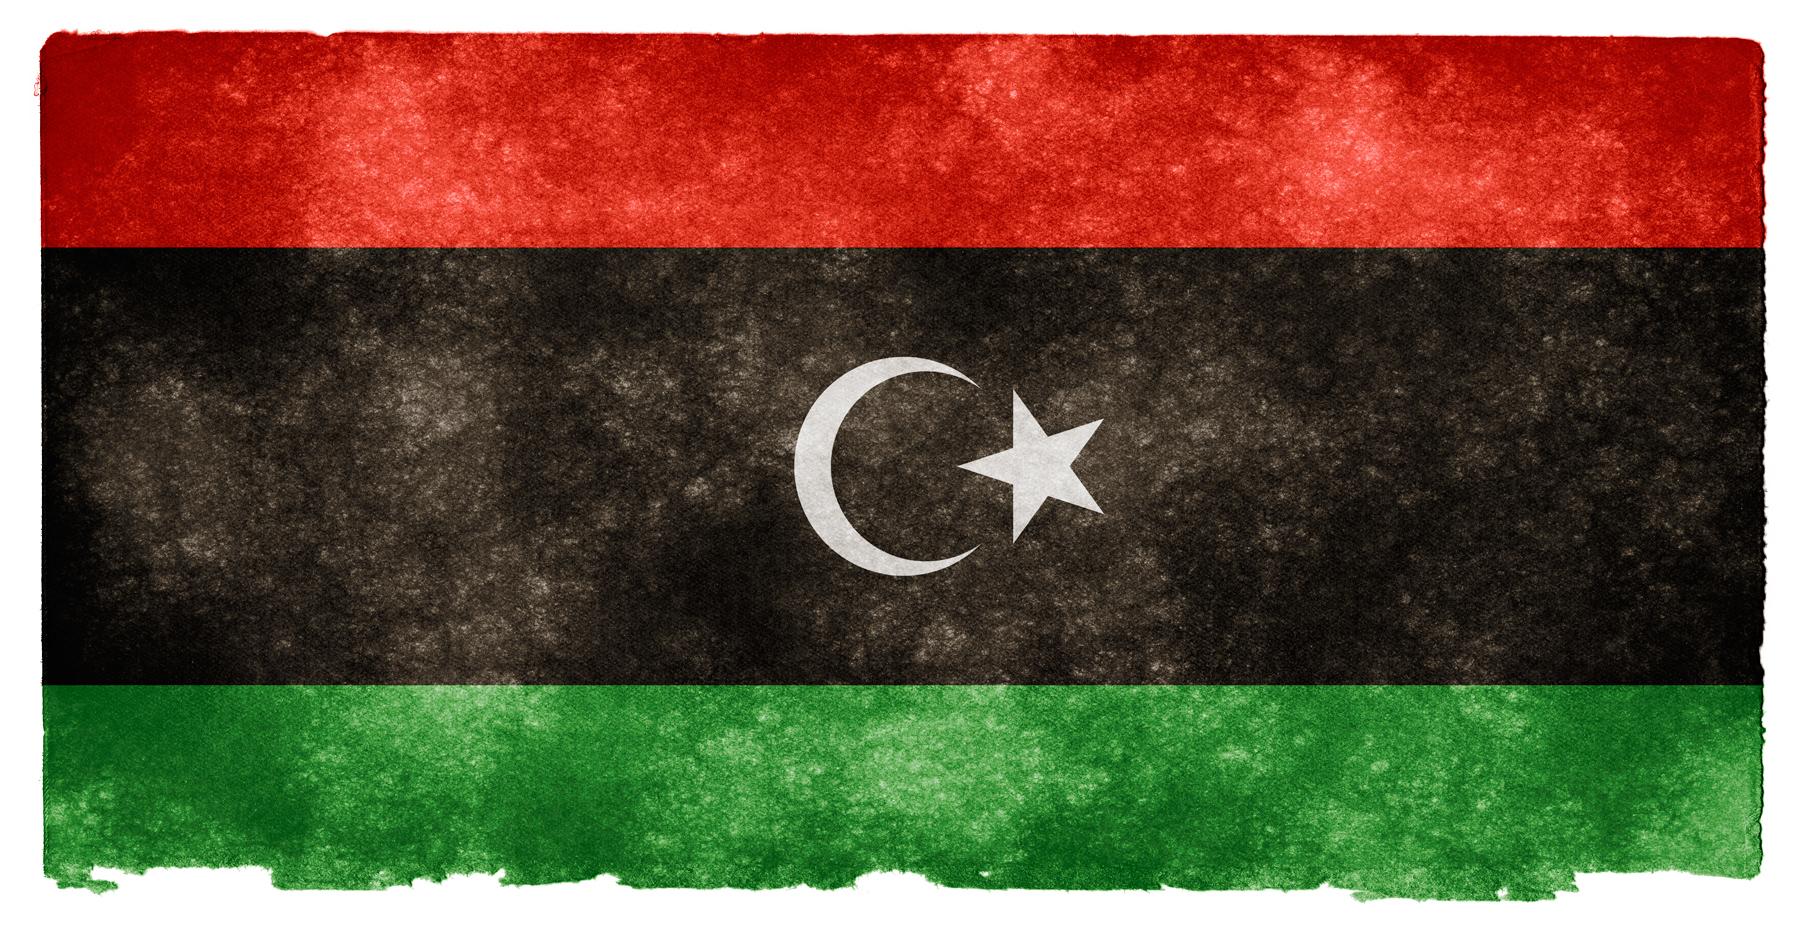 Libya Grunge Flag, Africa, Red, Libyan, Maghreb, HQ Photo